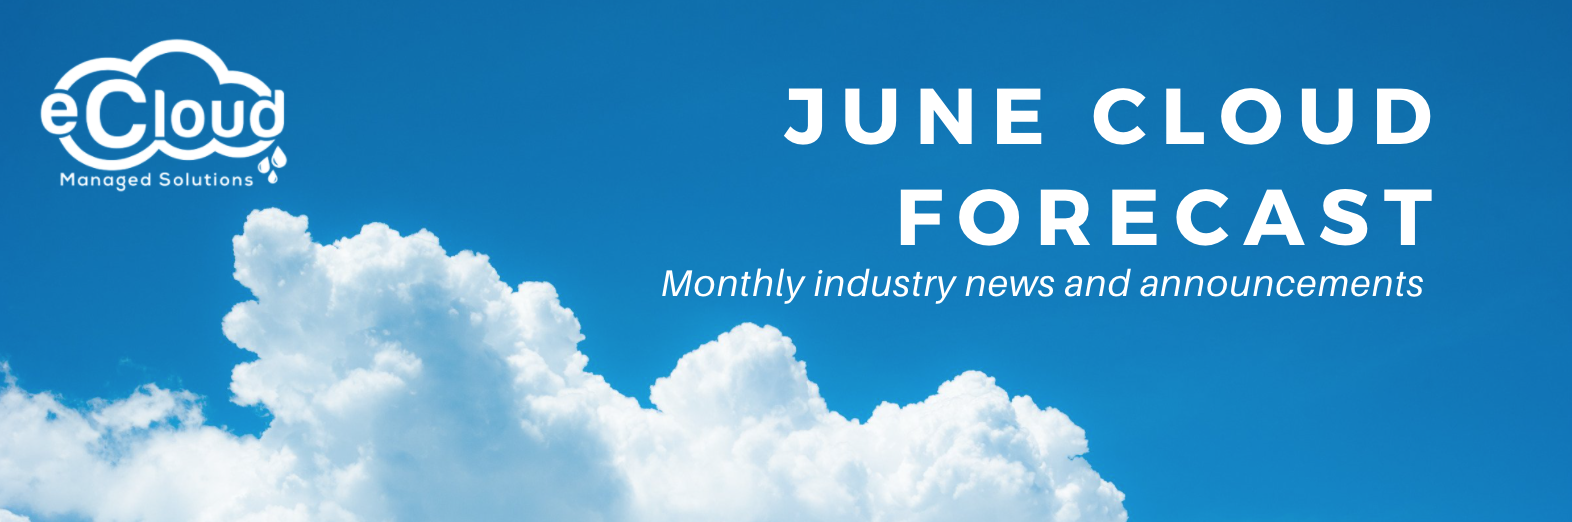 June Cloud Forecast